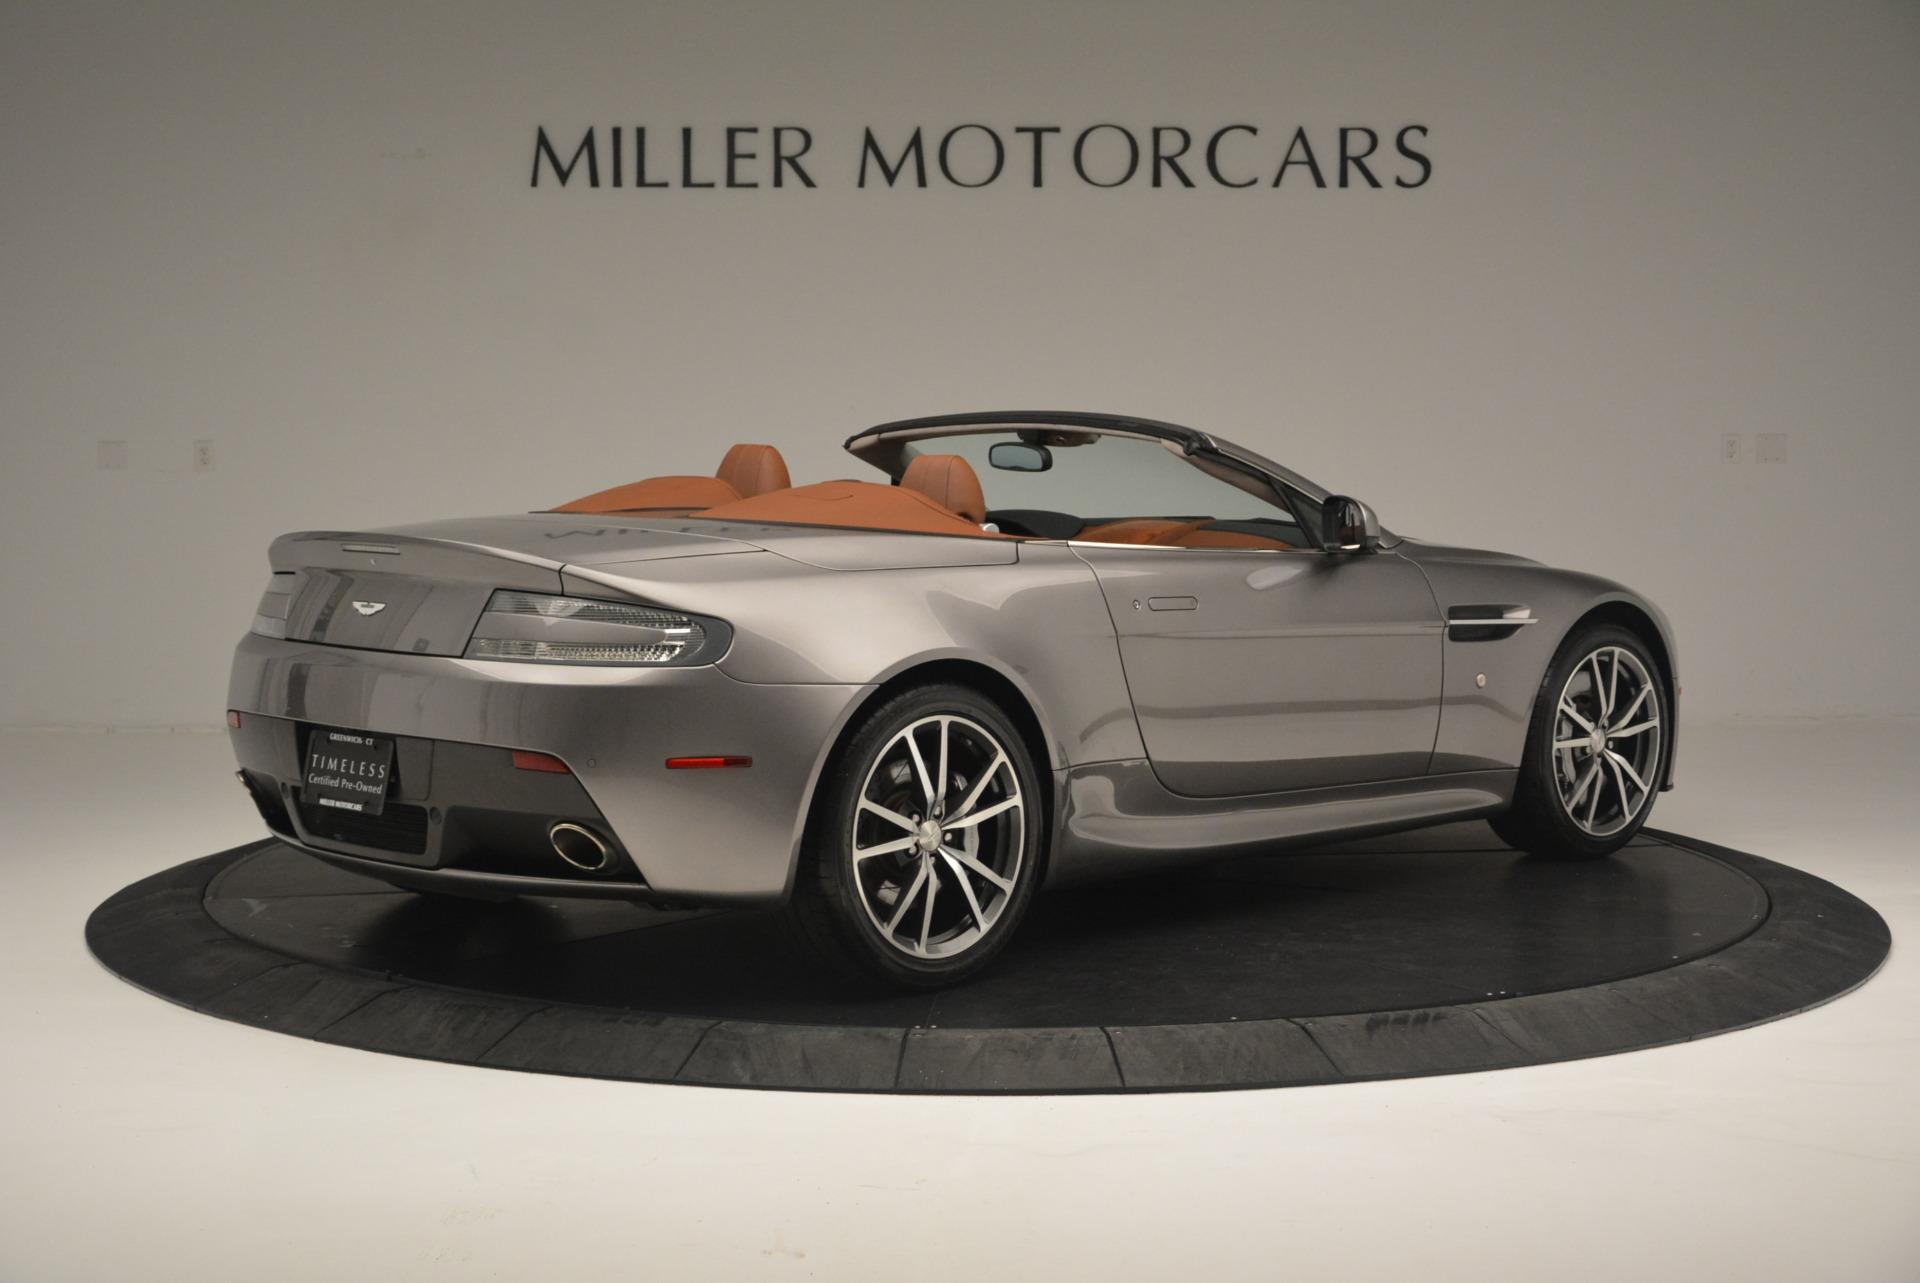 Used 2015 Aston Martin V8 Vantage Roadster For Sale In Greenwich, CT. Alfa Romeo of Greenwich, 7396 2463_p8